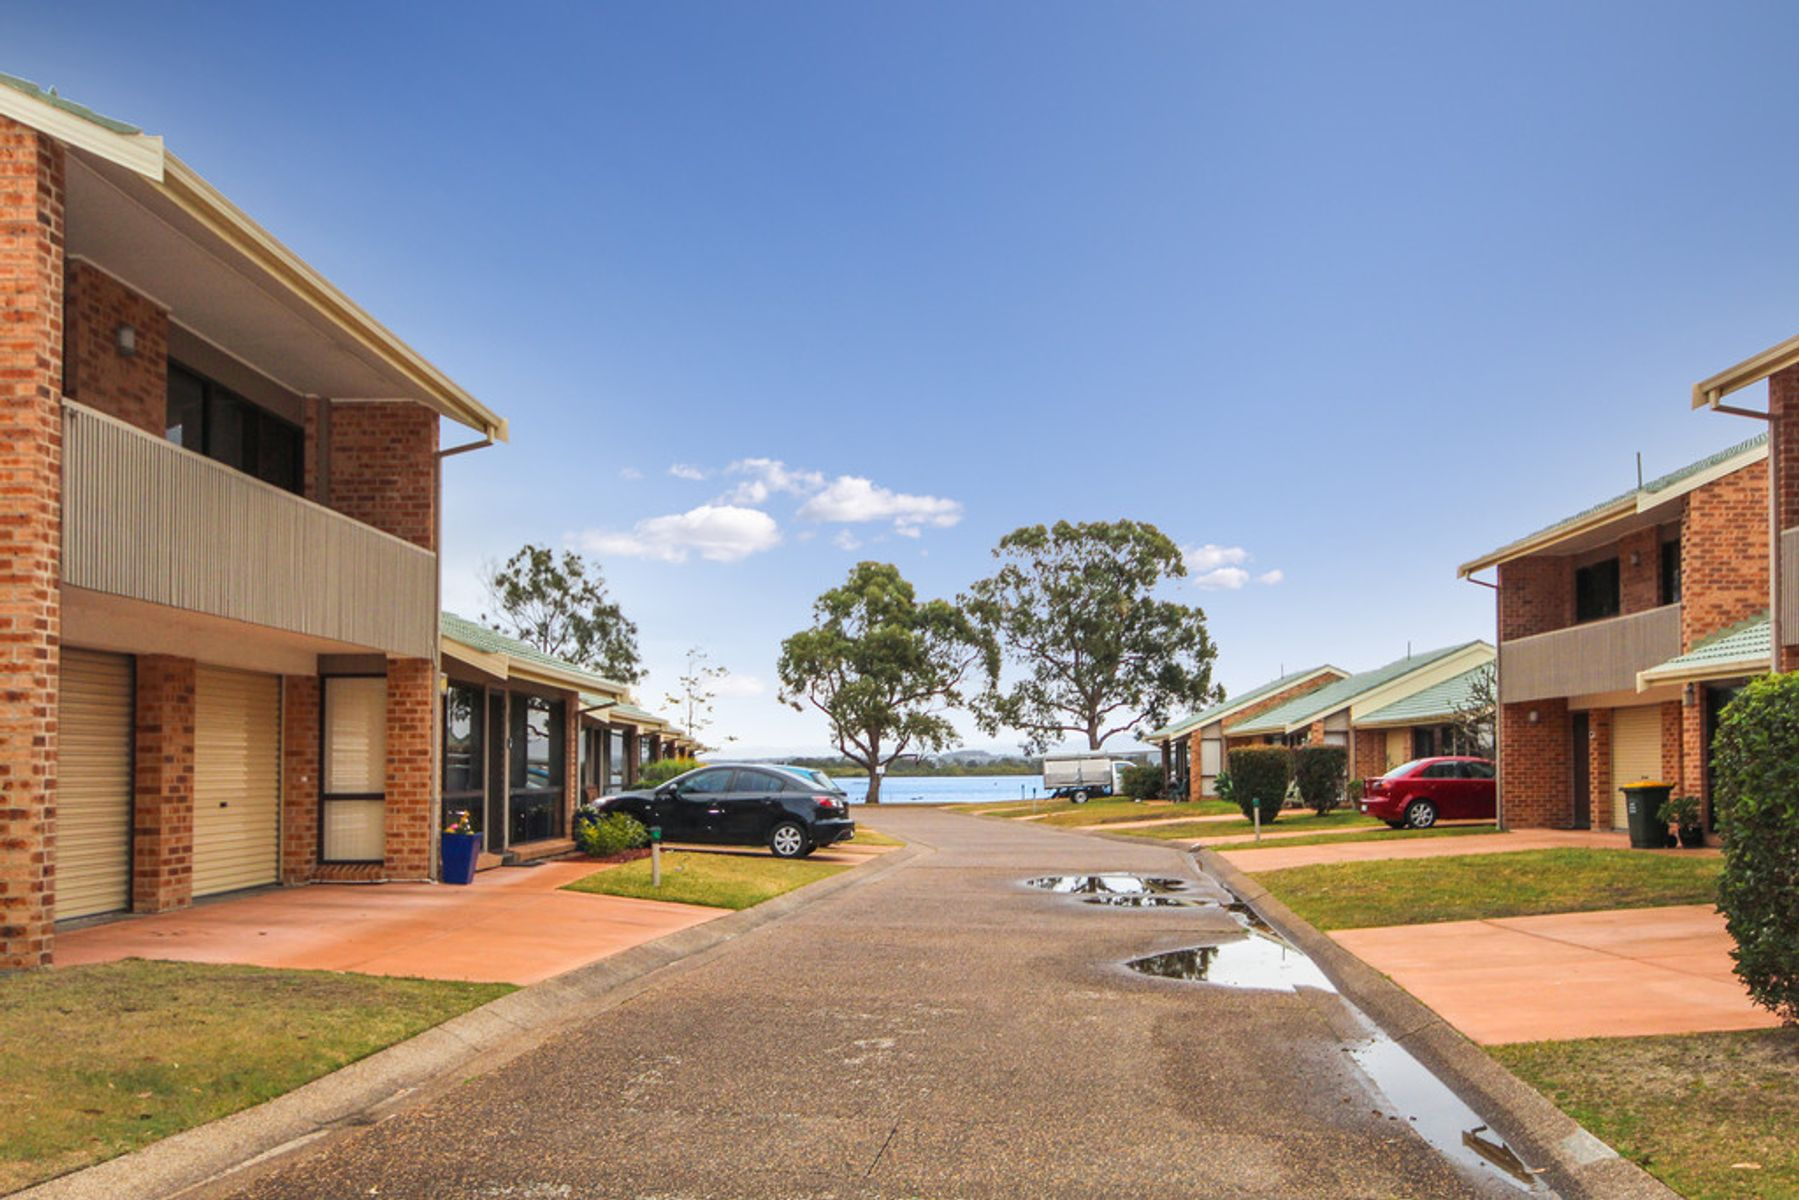 11/47-51 HADDON CRESCENT, Marks Point, NSW 2280